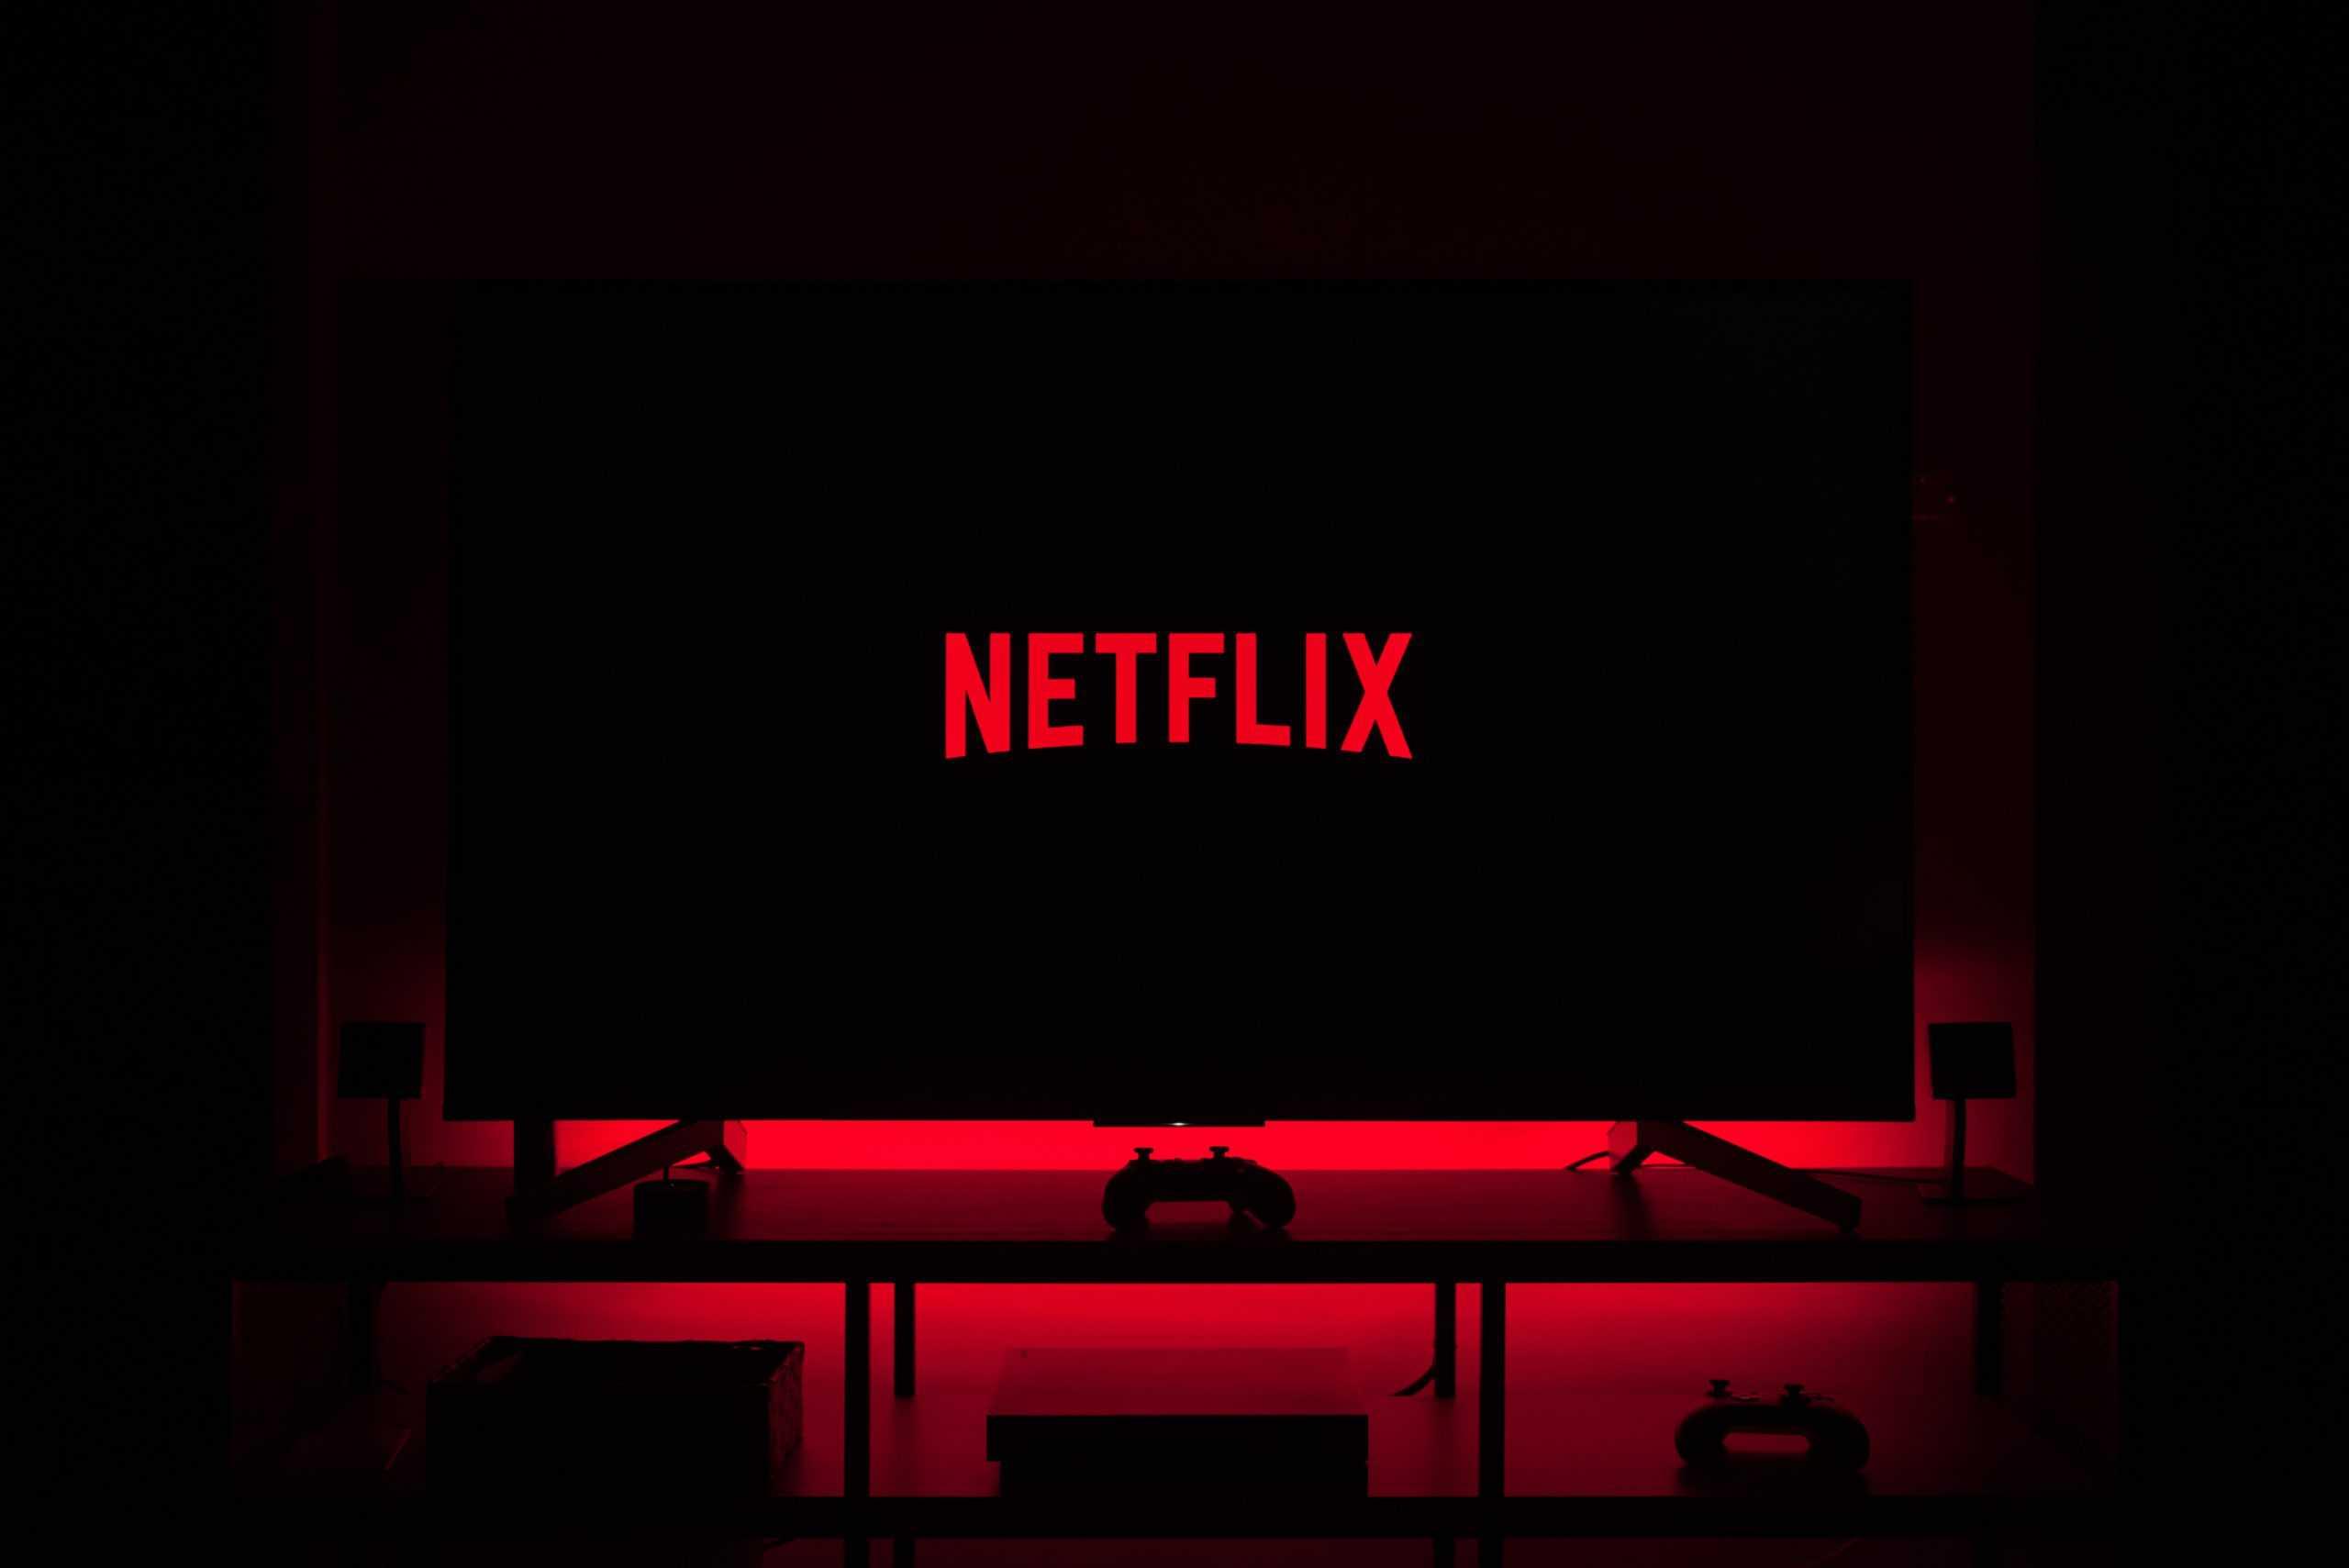 Netflix izleme geçmişi